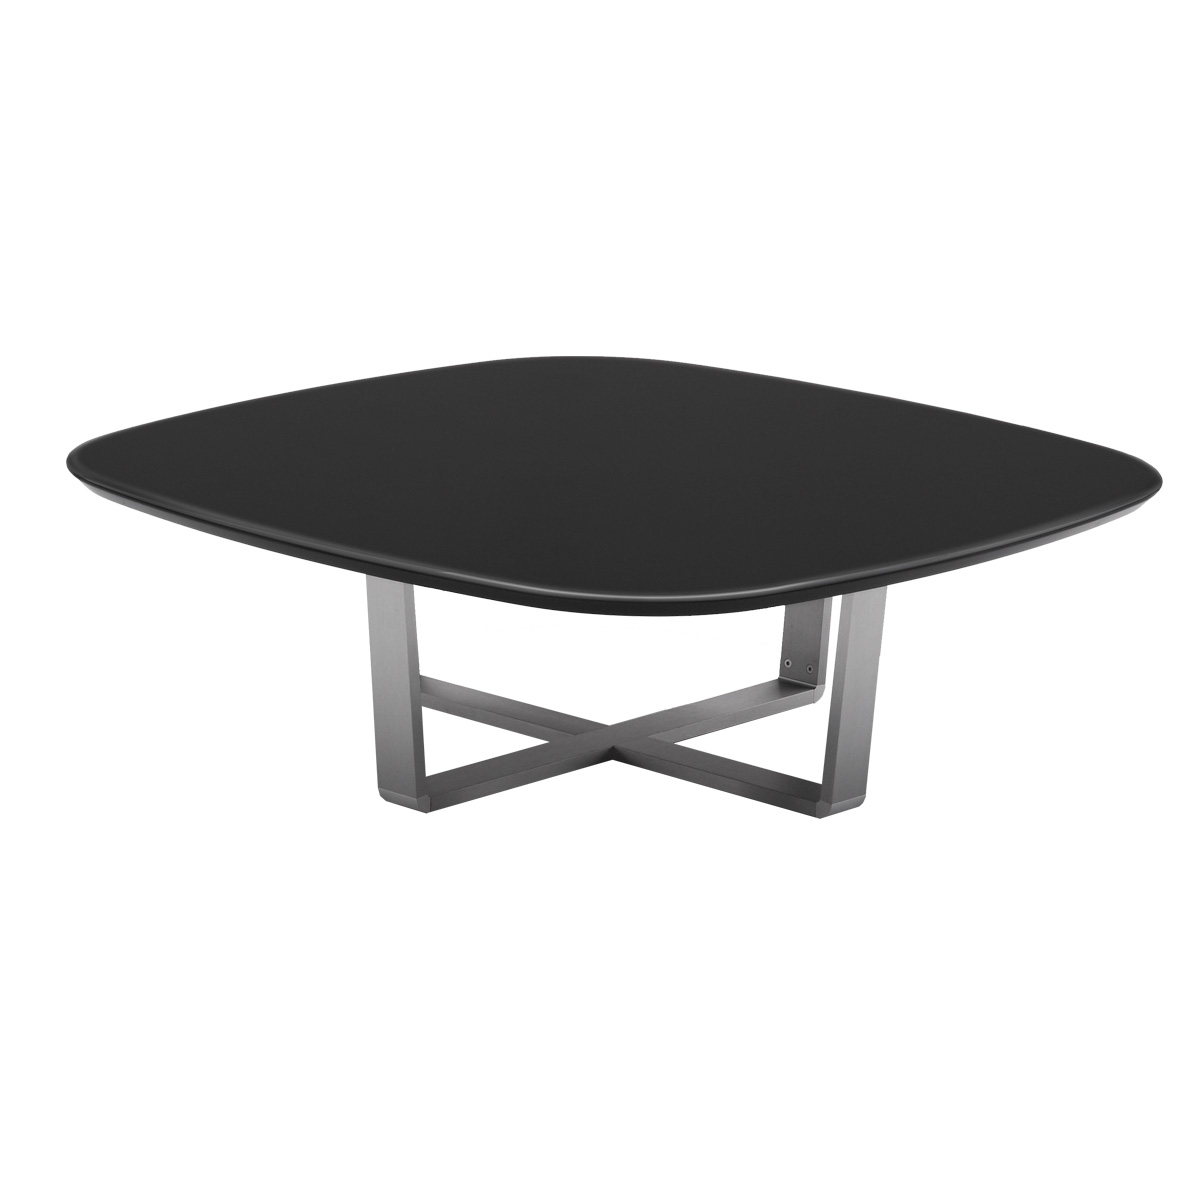 CINTURA SQUARE COFFEE TABLE Beyond Furniture : cintura square 1 from www.beyondfurniture.com.au size 1200 x 1200 jpeg 106kB